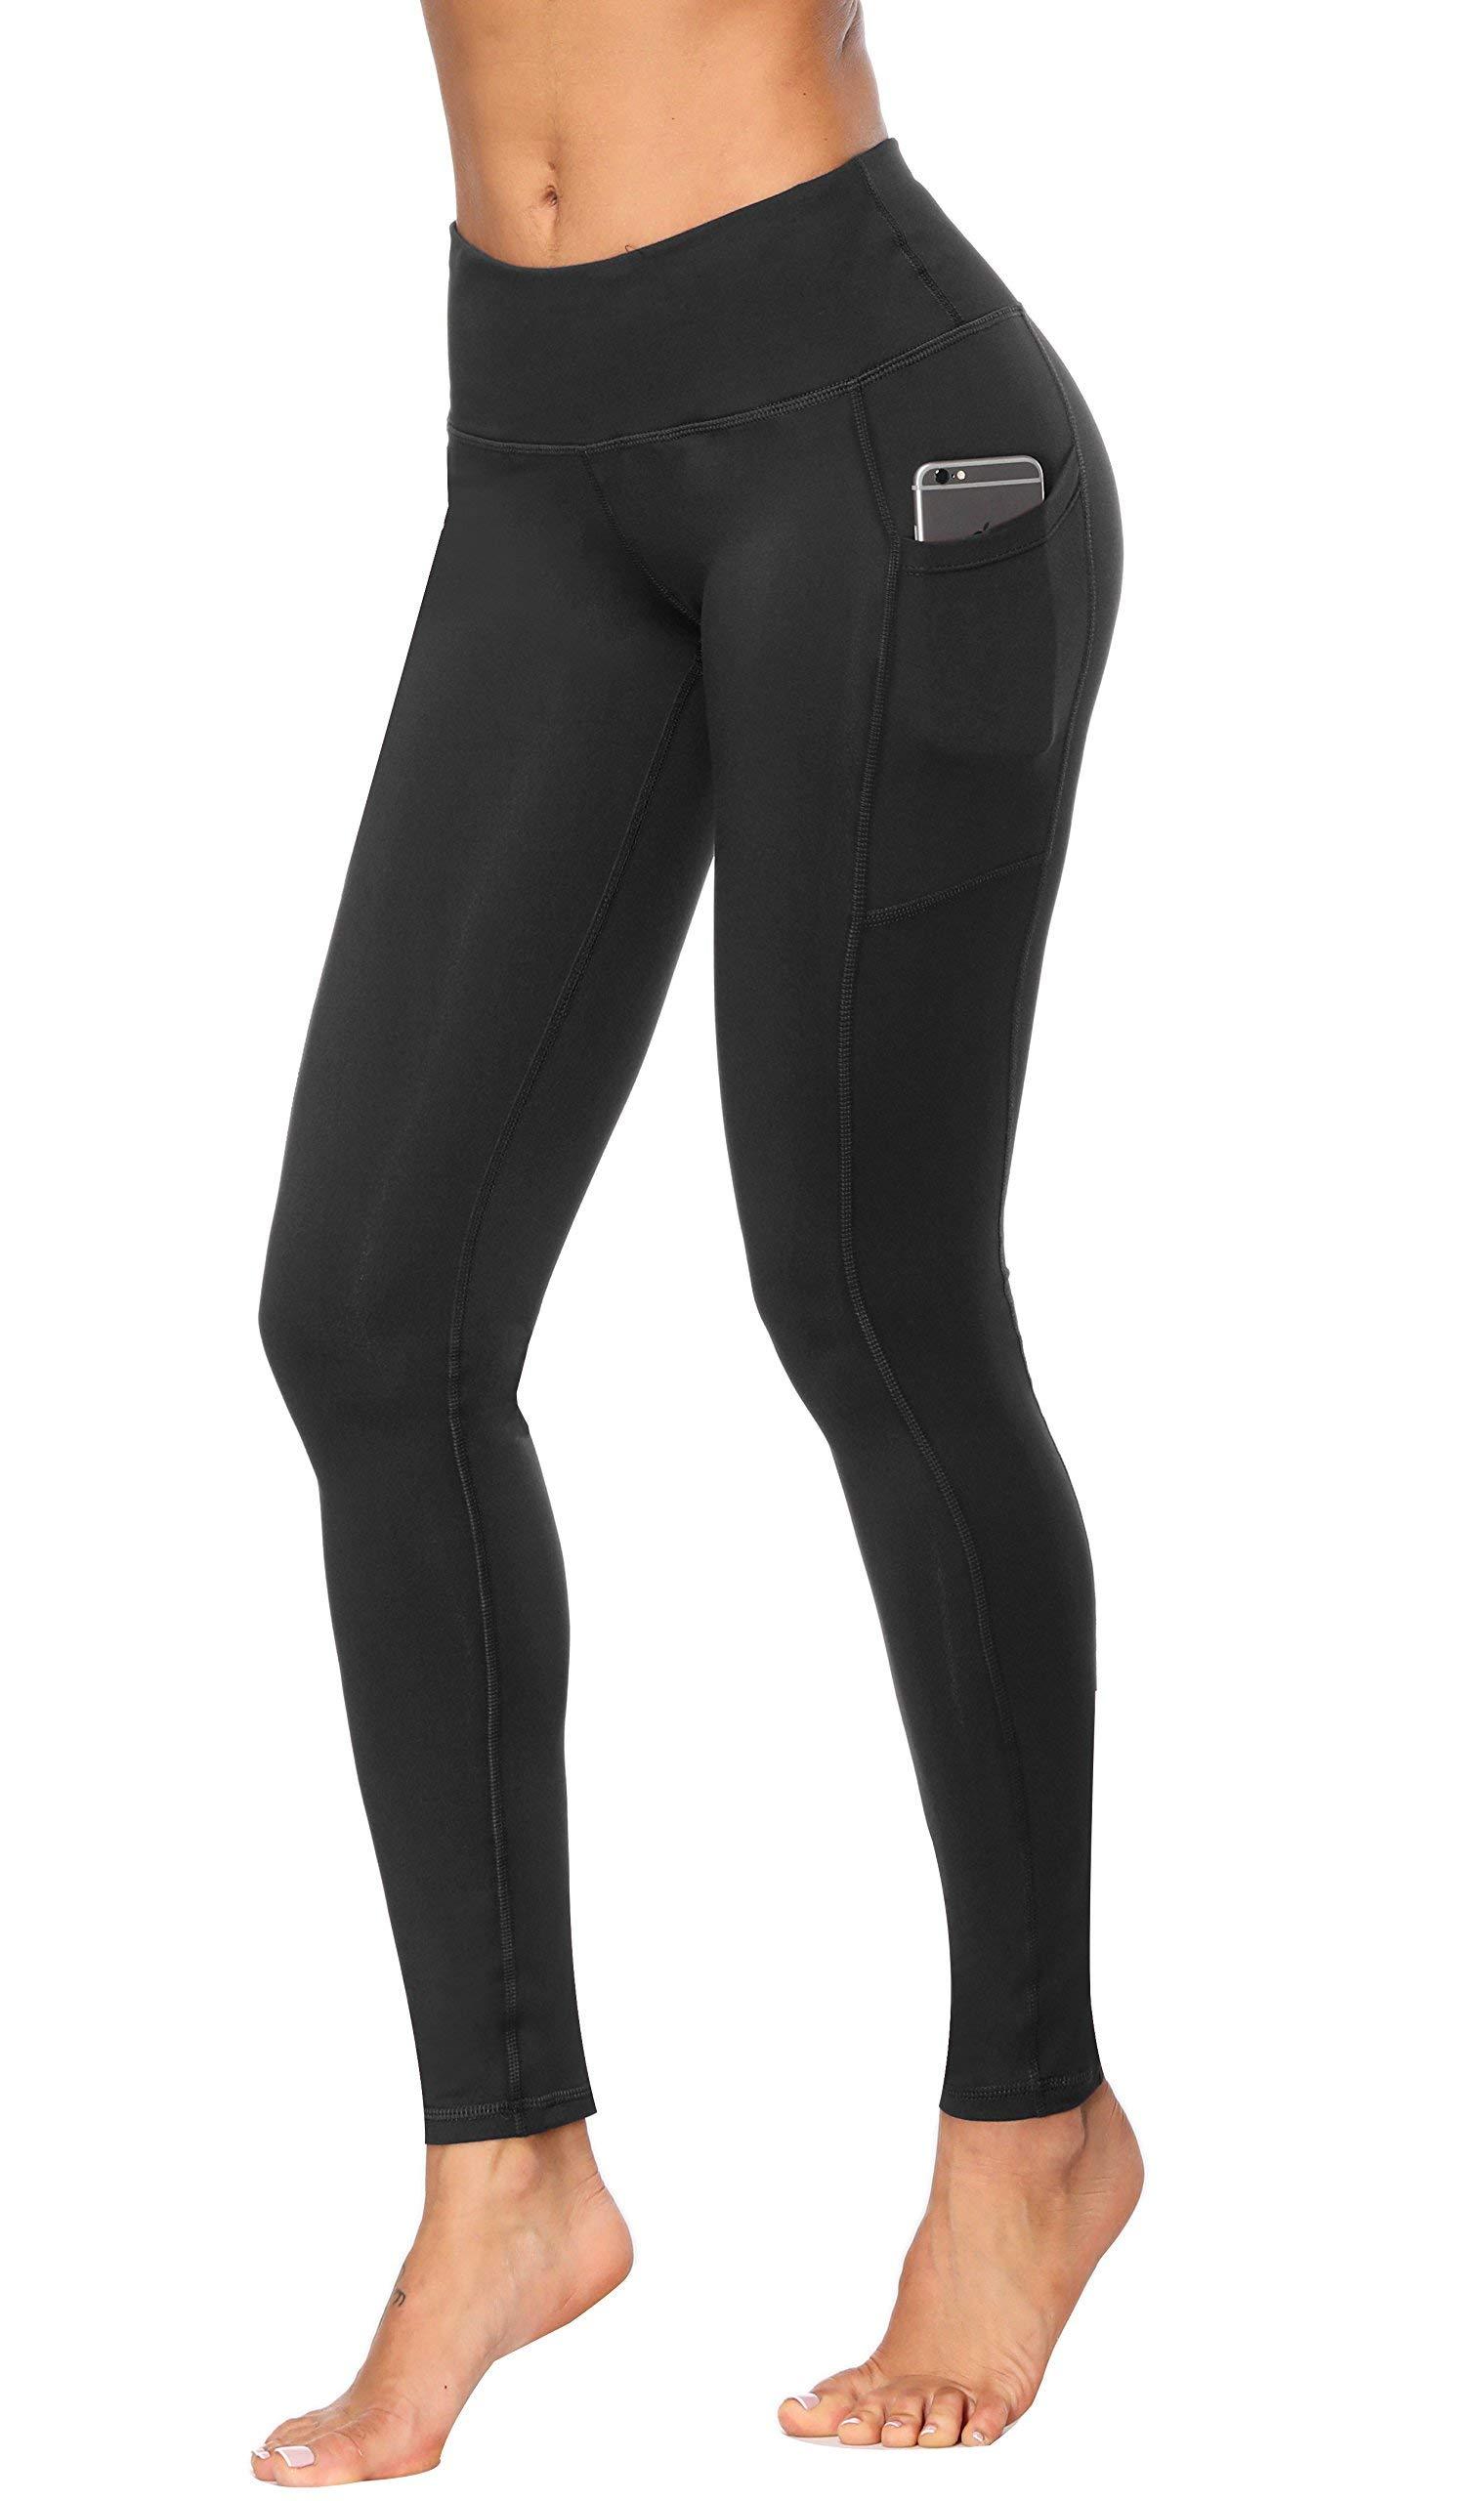 Fengbay High Waist Yoga Pants, Pocket Yoga Pants Tummy Control Workout Running 4 Way Stretch Yoga Leggings (Medium, L Black)